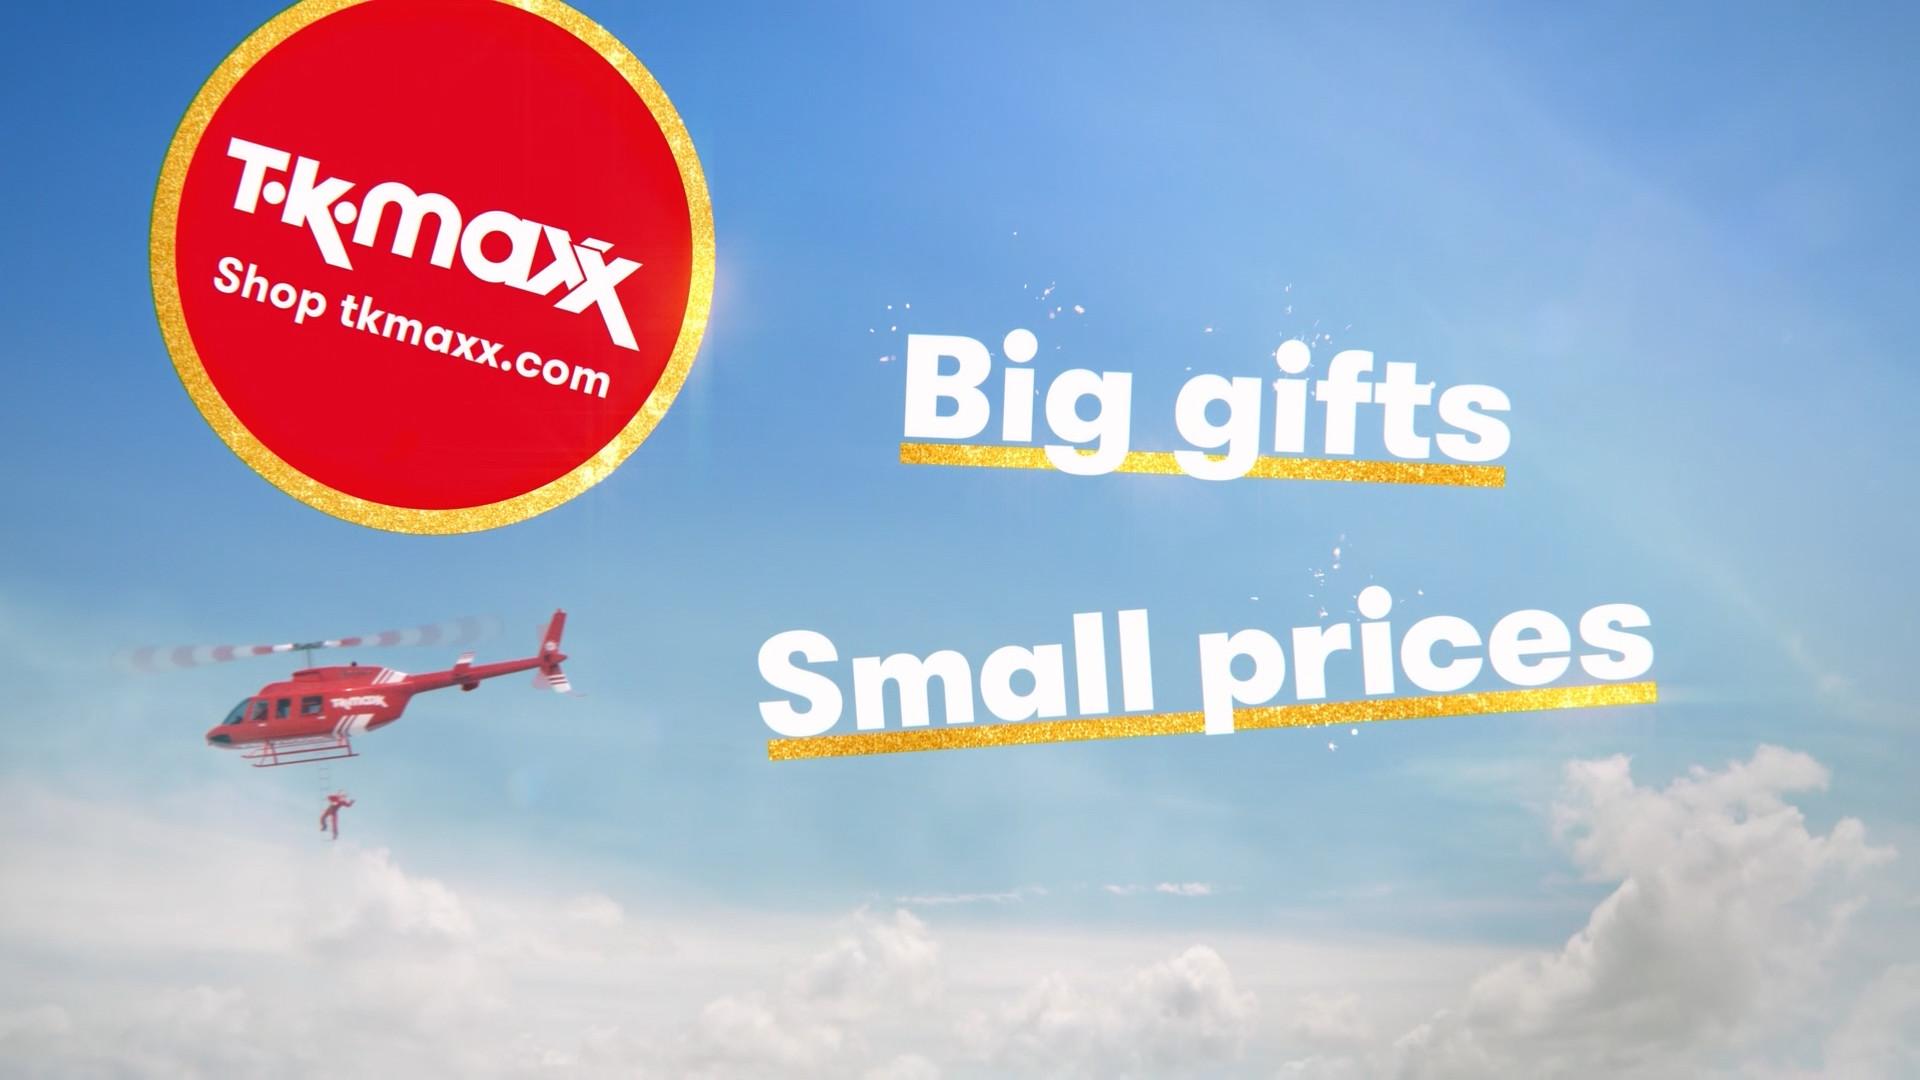 TK Maxx - White Christmas_1-0054